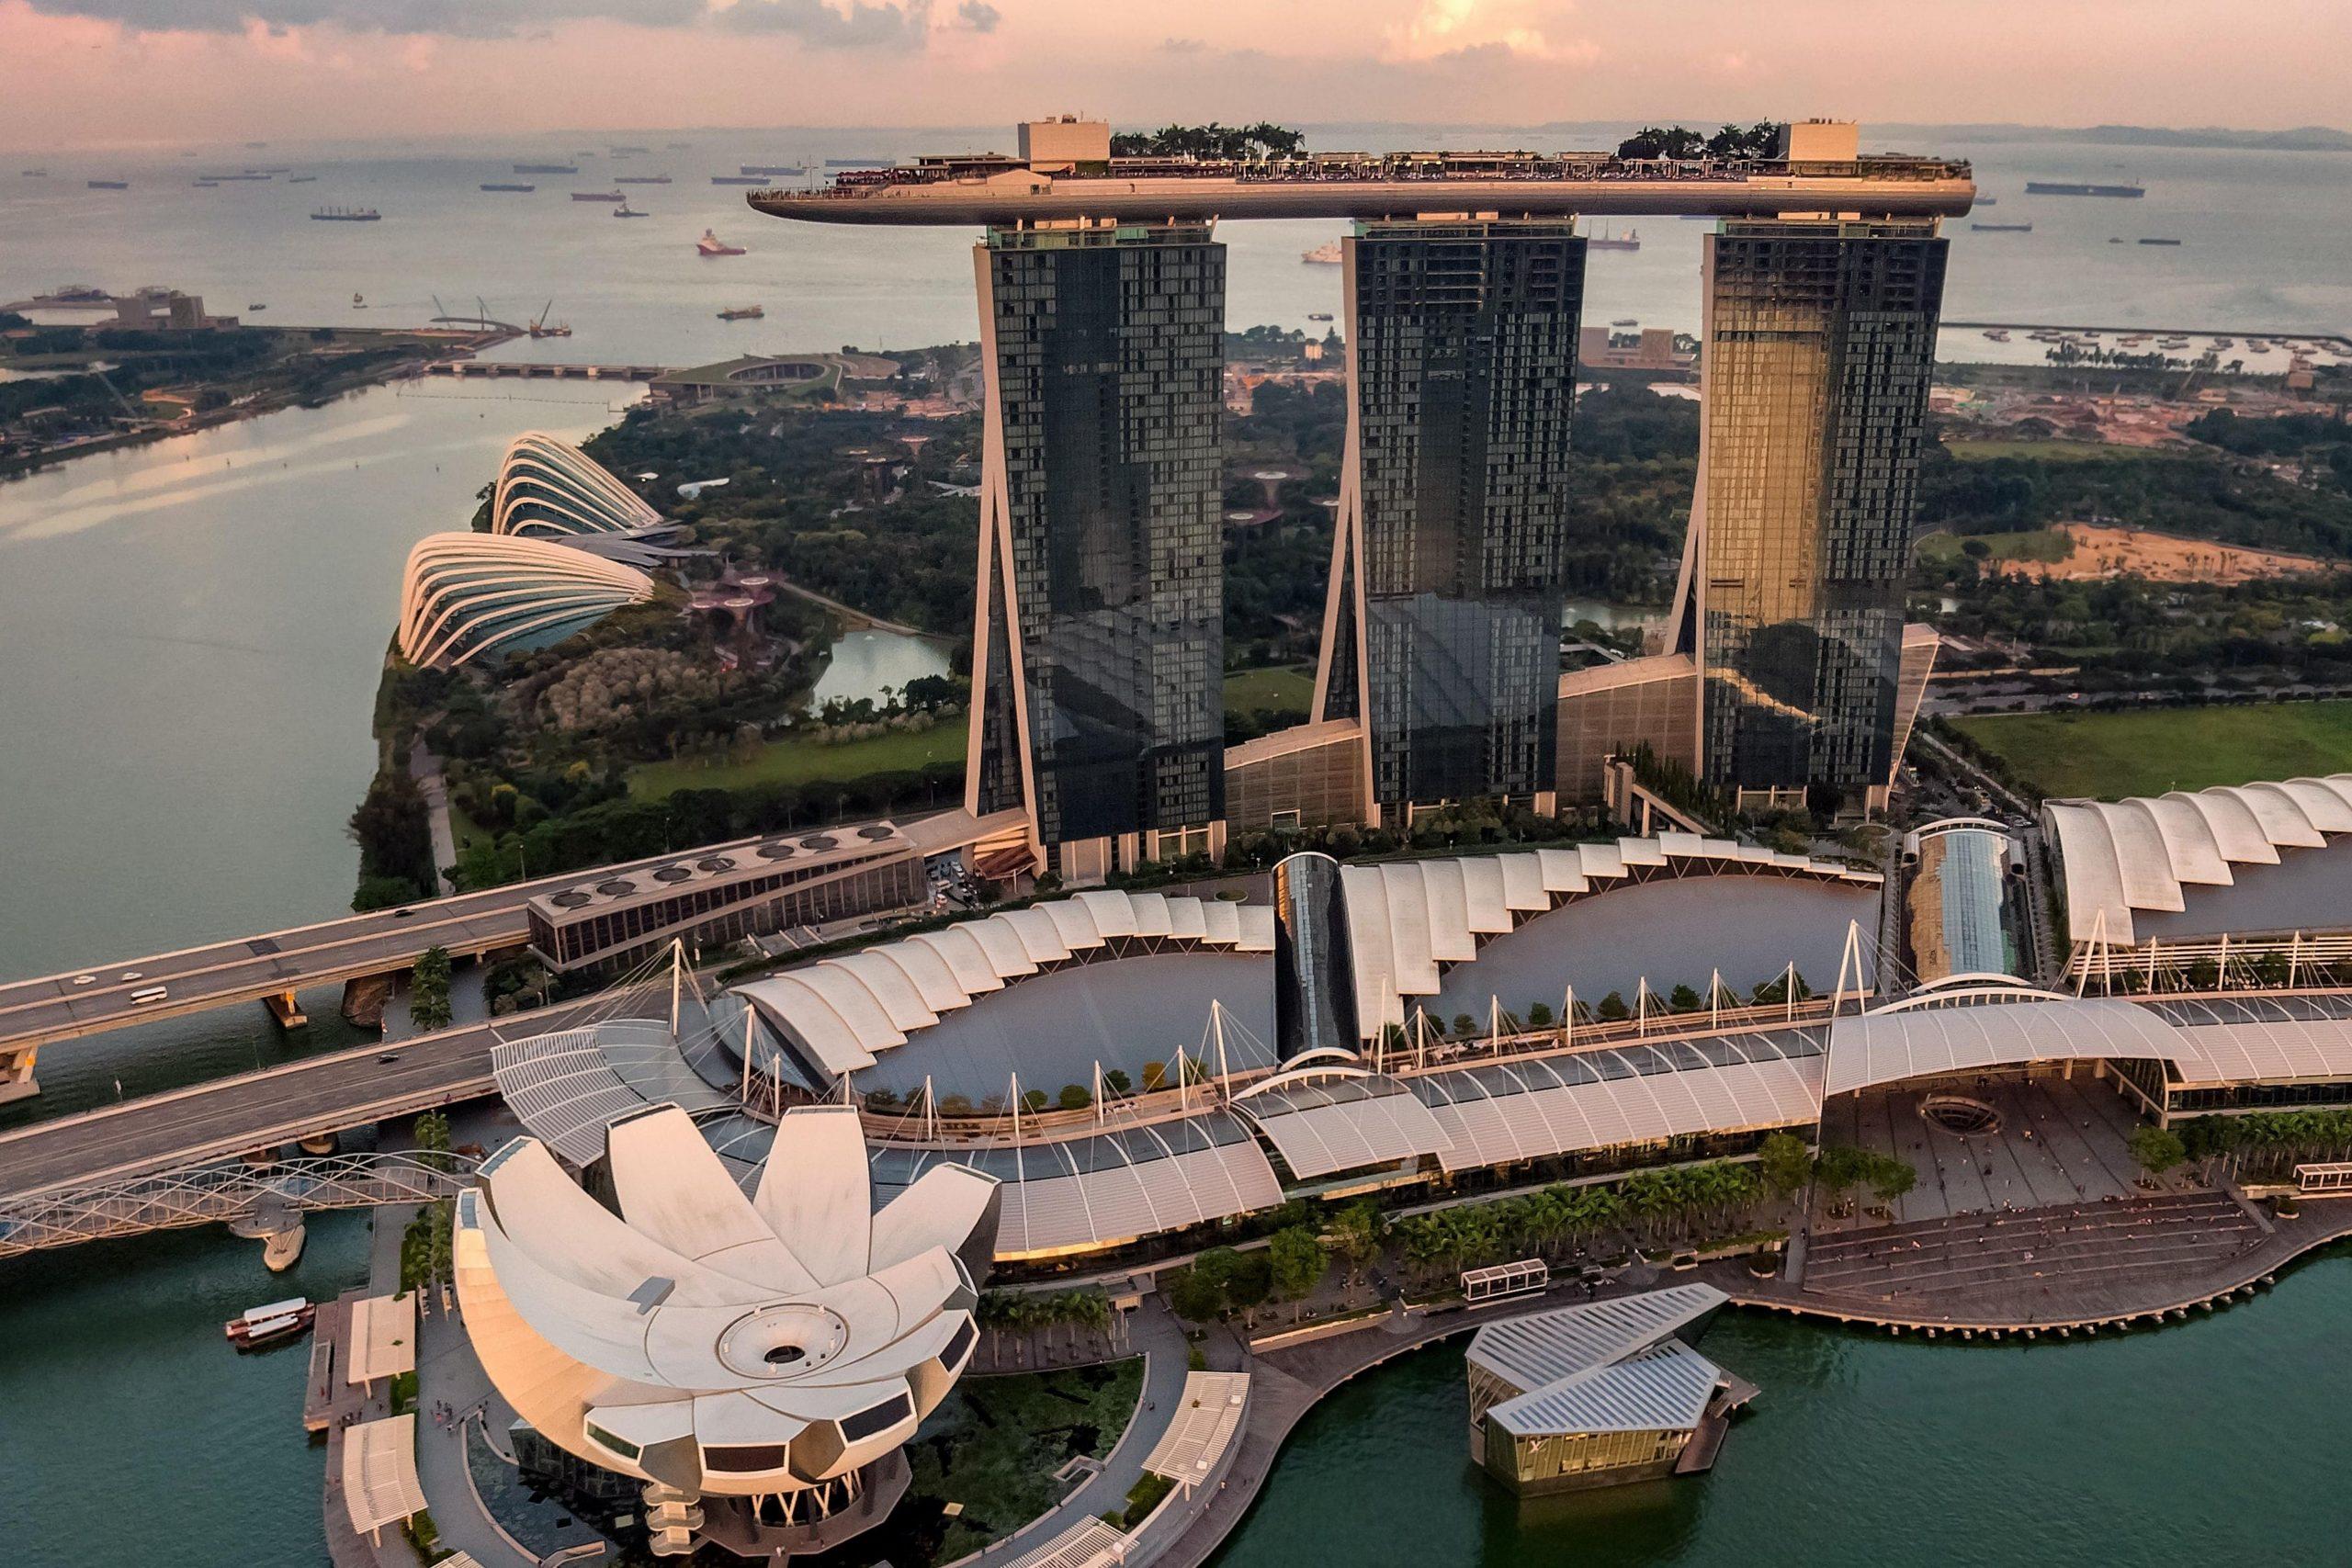 Covid19 in Singapore